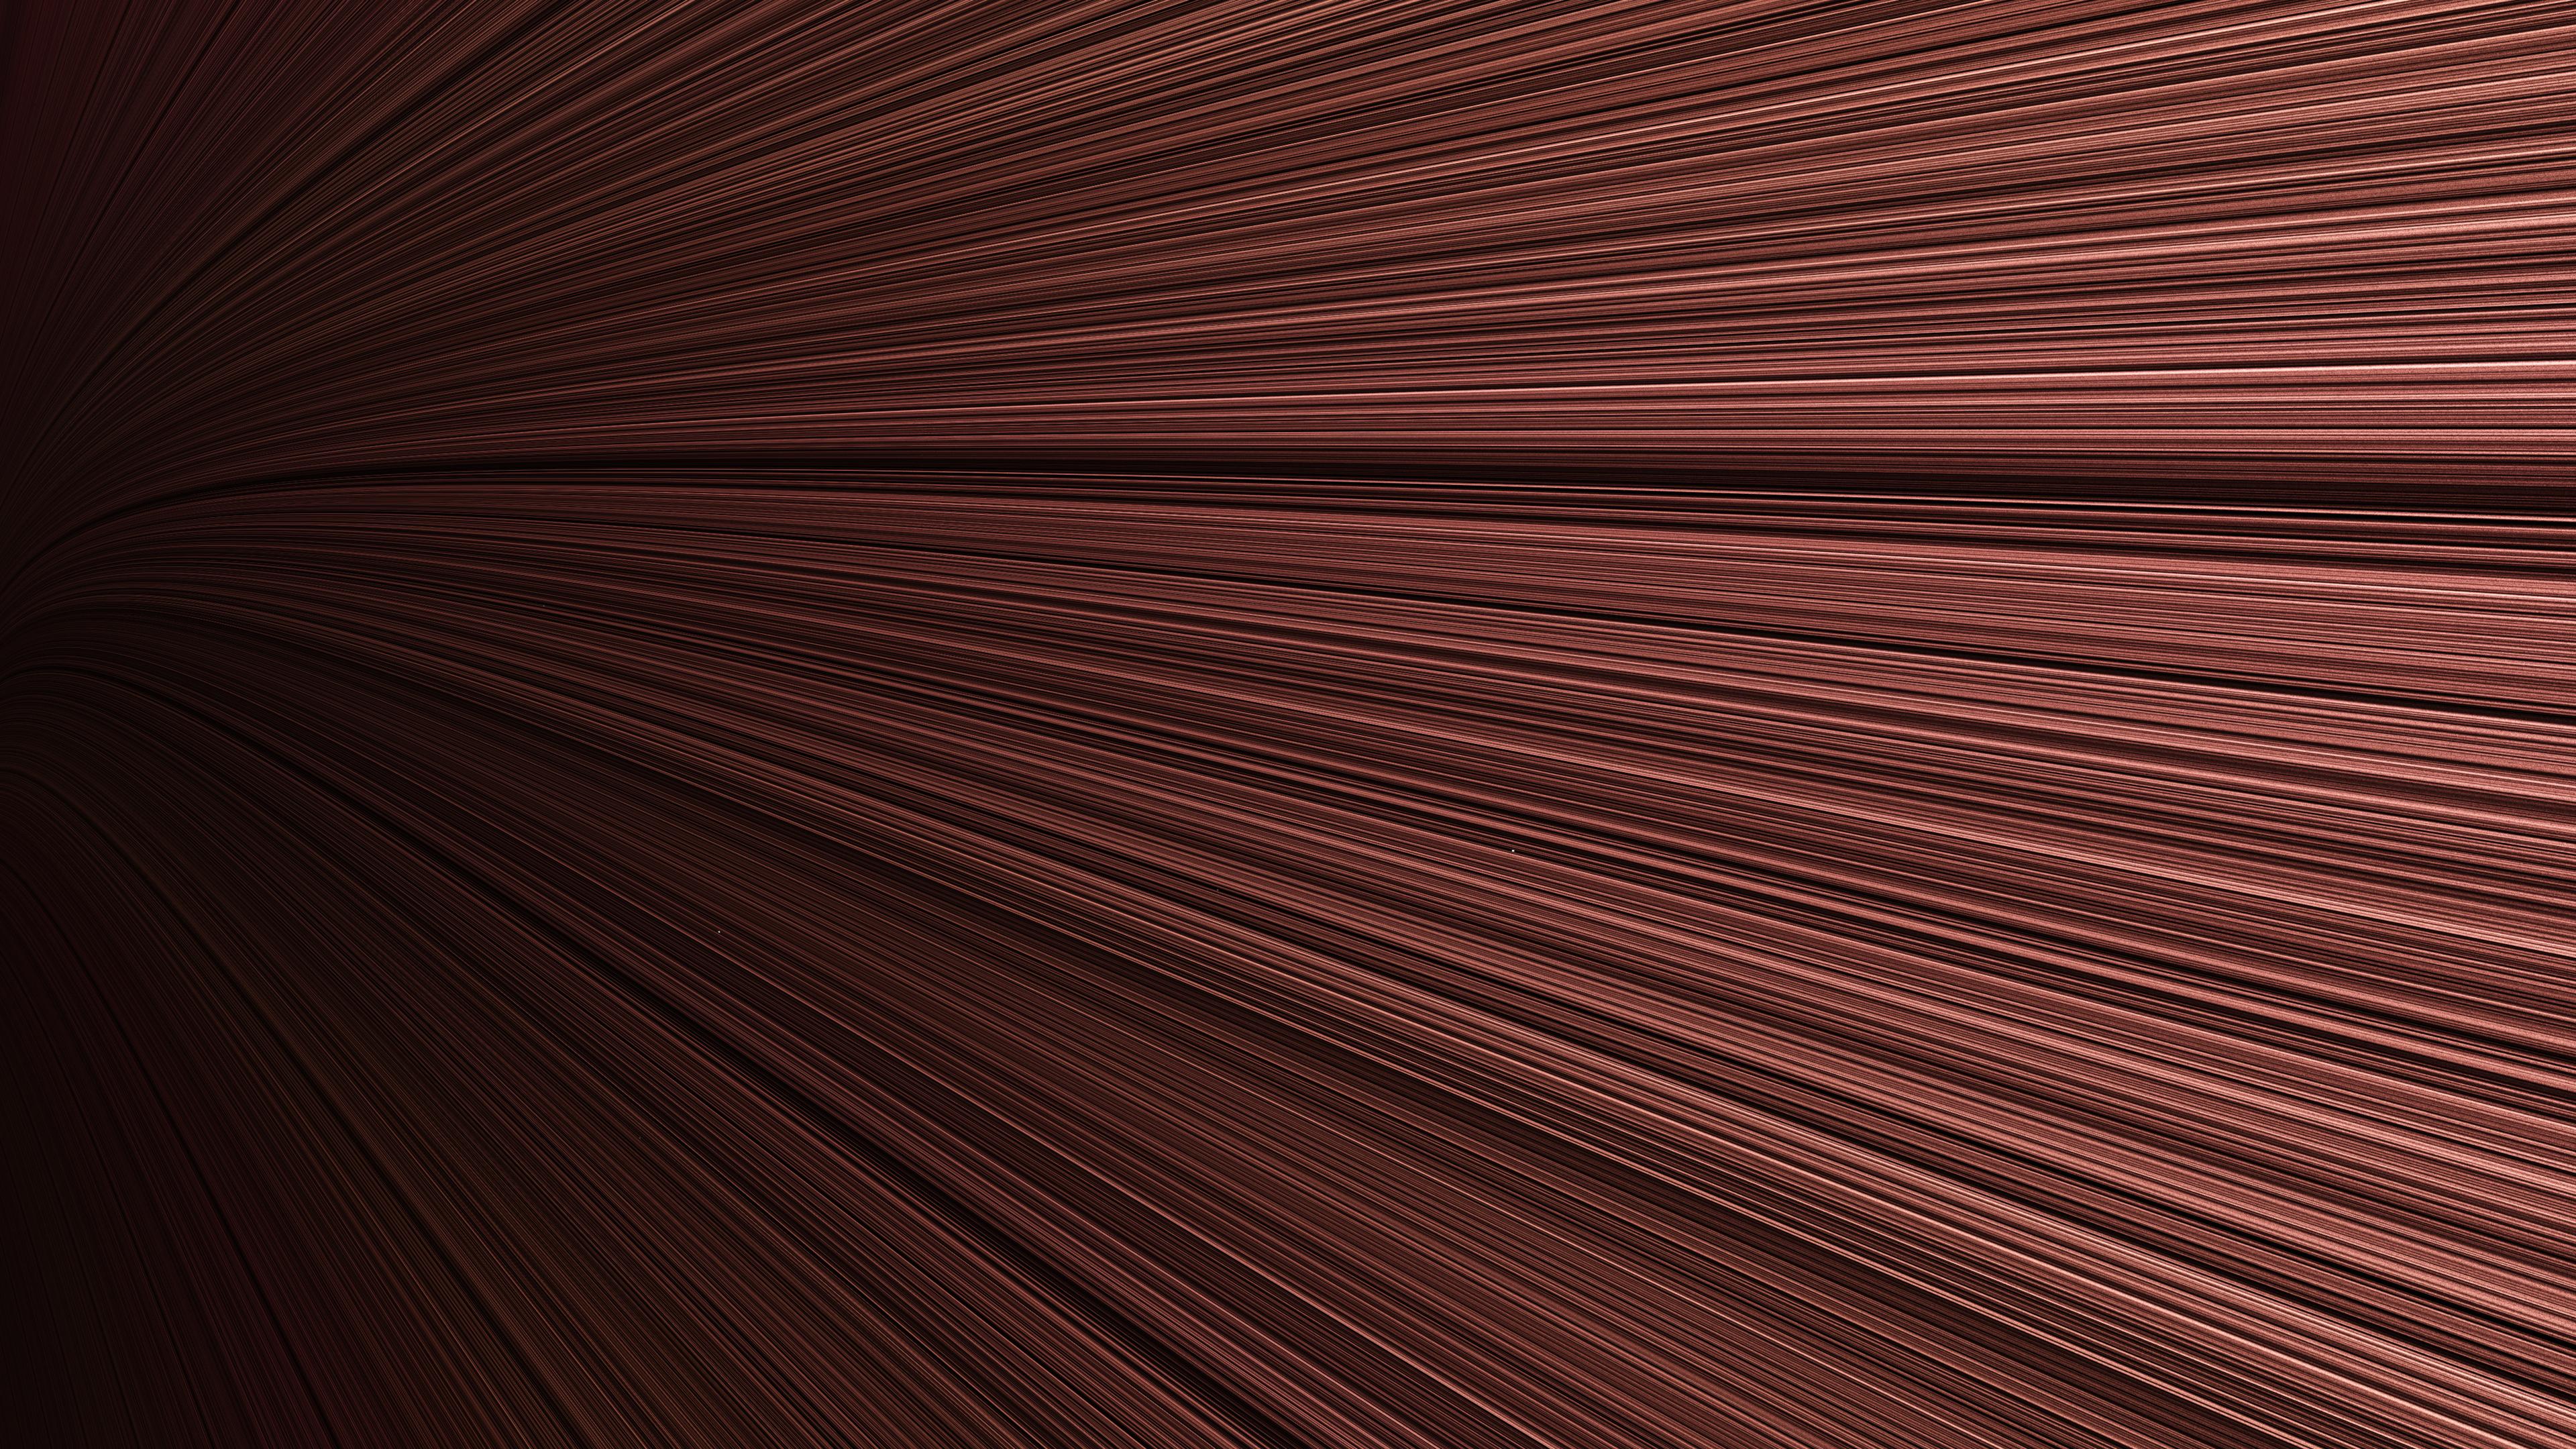 space engine lines 4k 1555208117 - Space Engine Lines 4k - hd-wallpapers, abstract wallpapers, 5k wallpapers, 4k-wallpapers